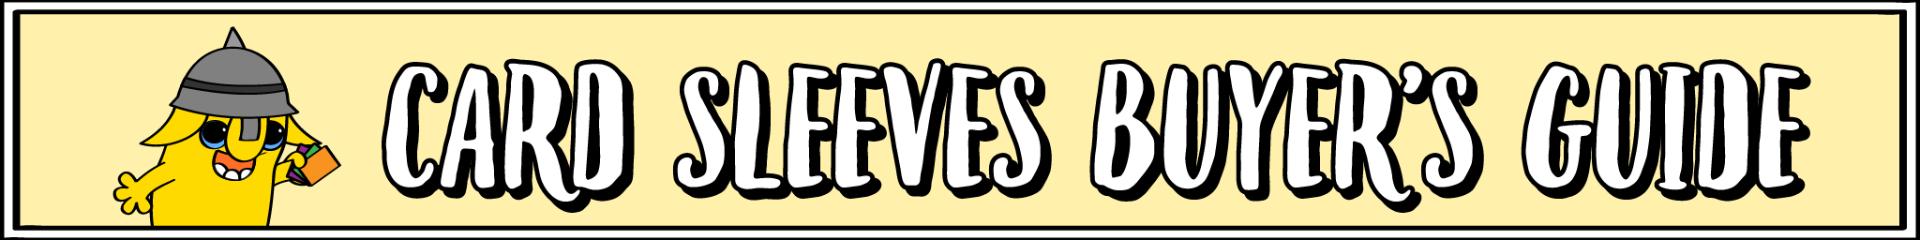 Card Sleeves Buyer's Guide